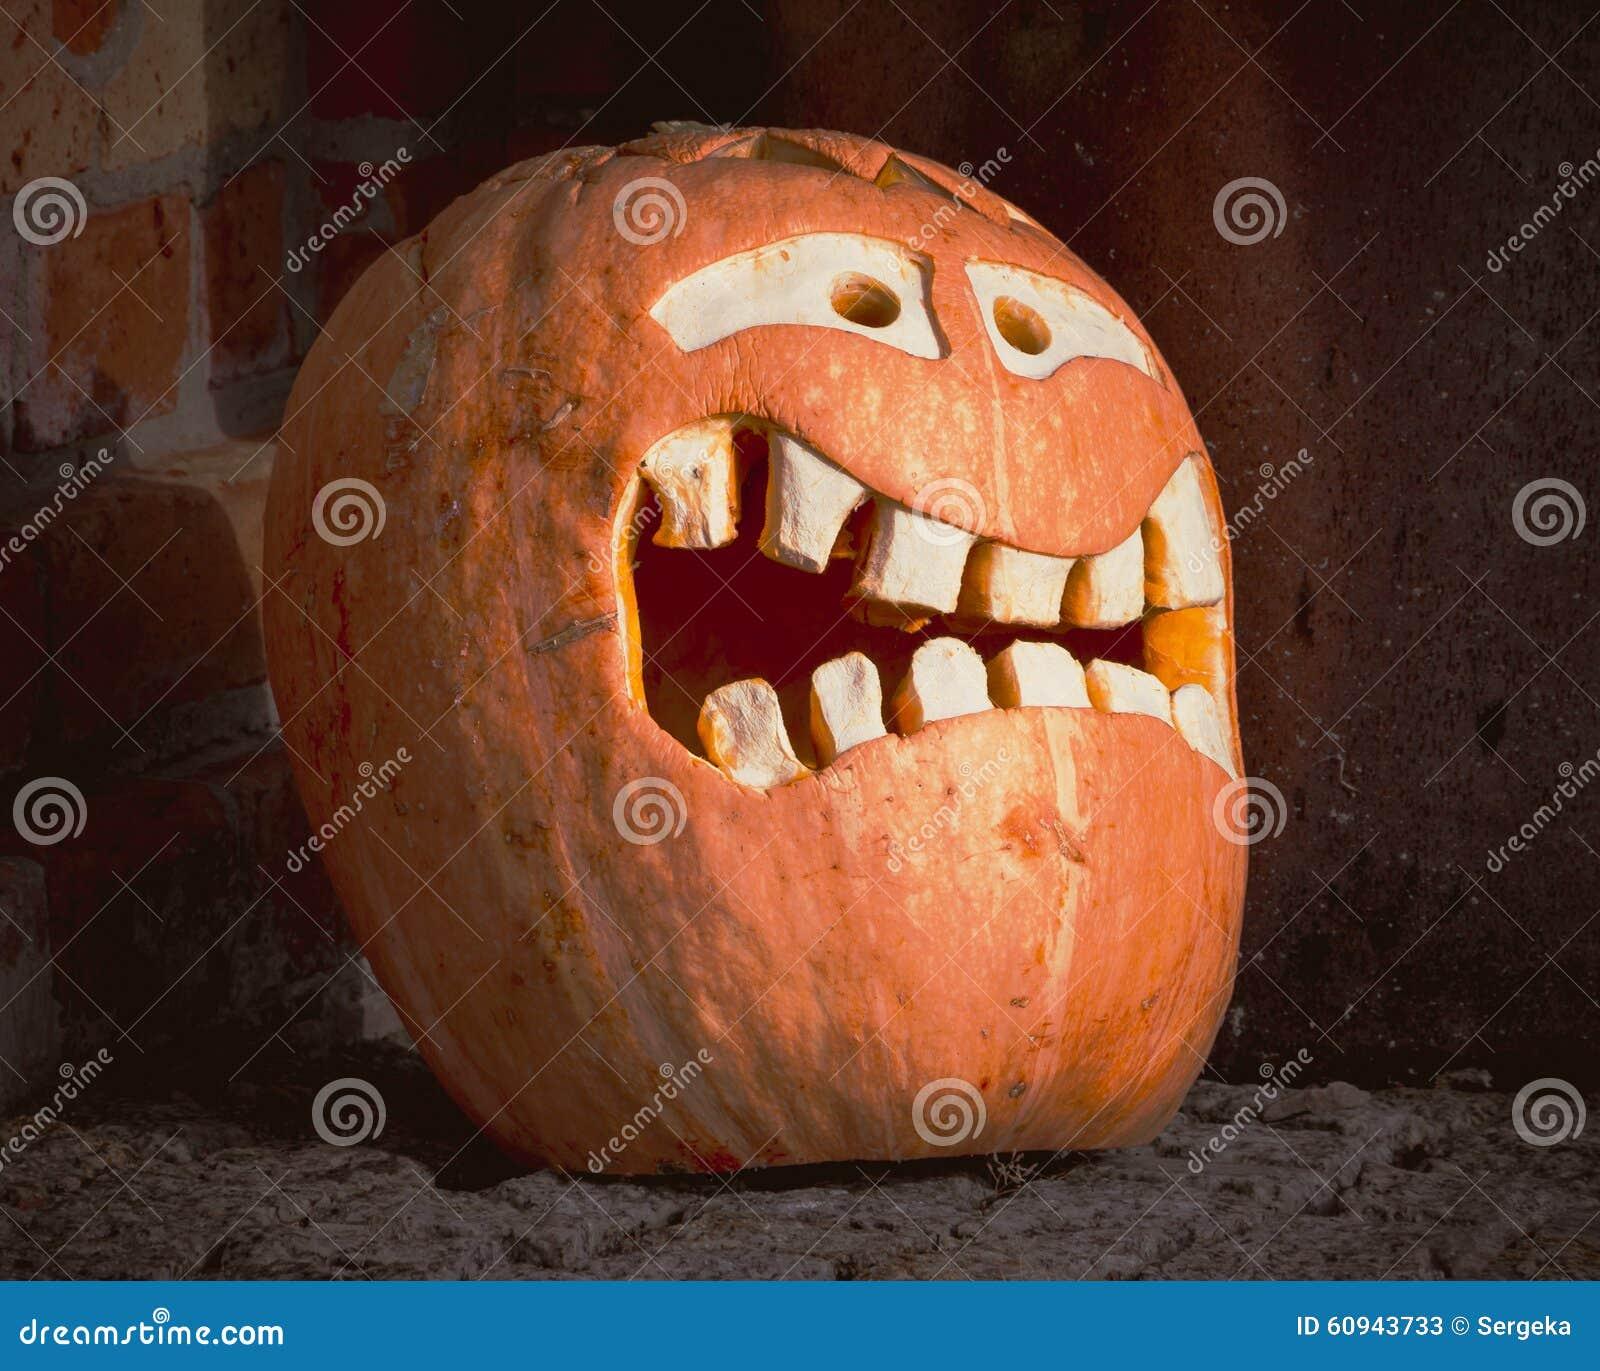 Halloween.The Mask Of Pumpkin Stock Photo - Image: 60943733